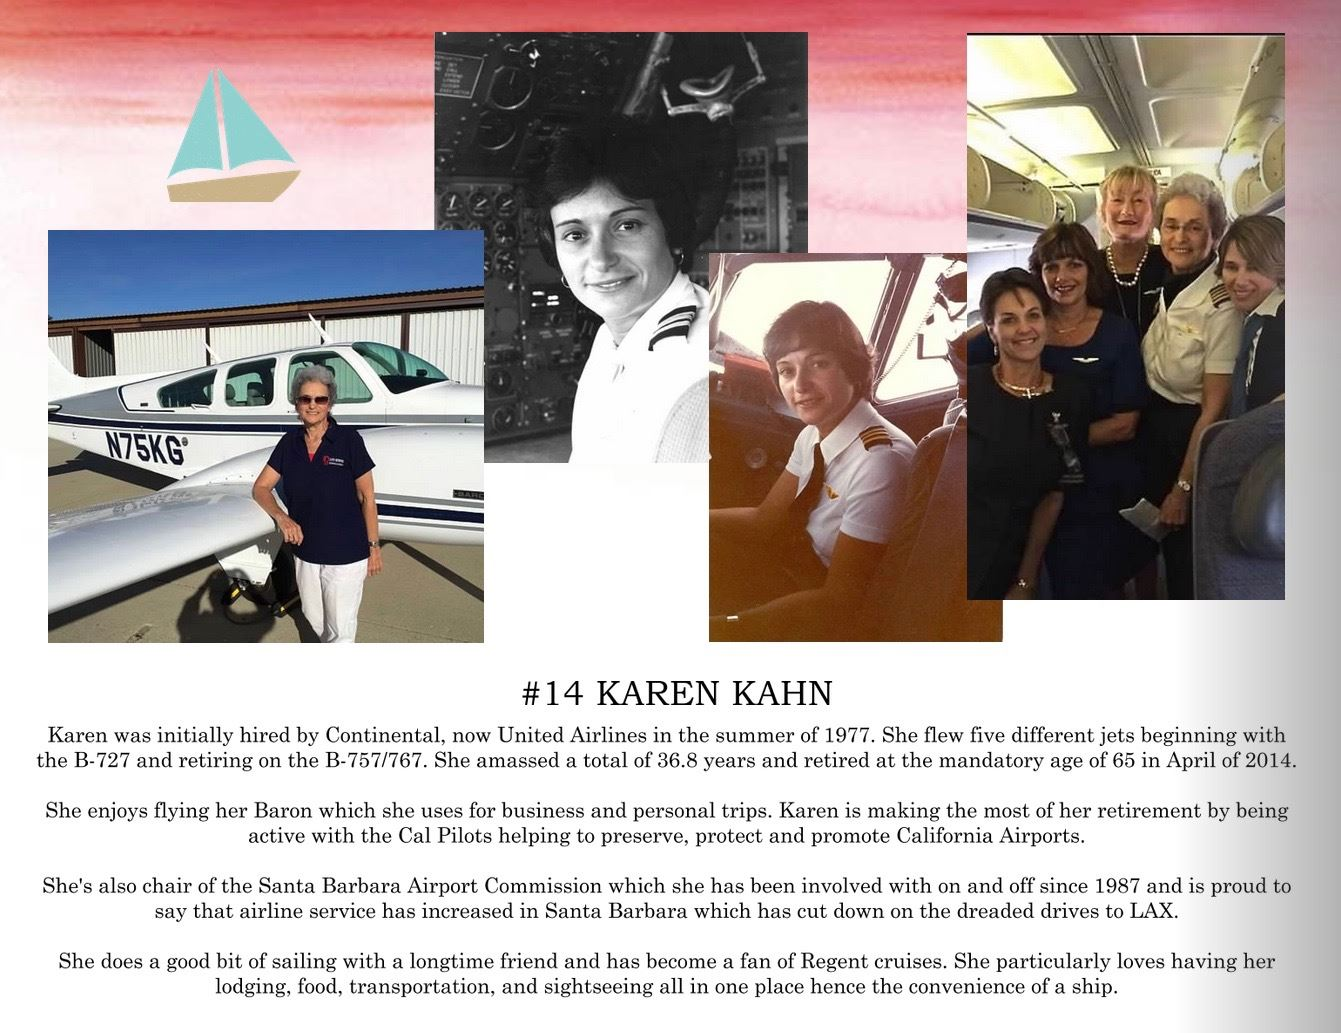 14. Karen Kahn